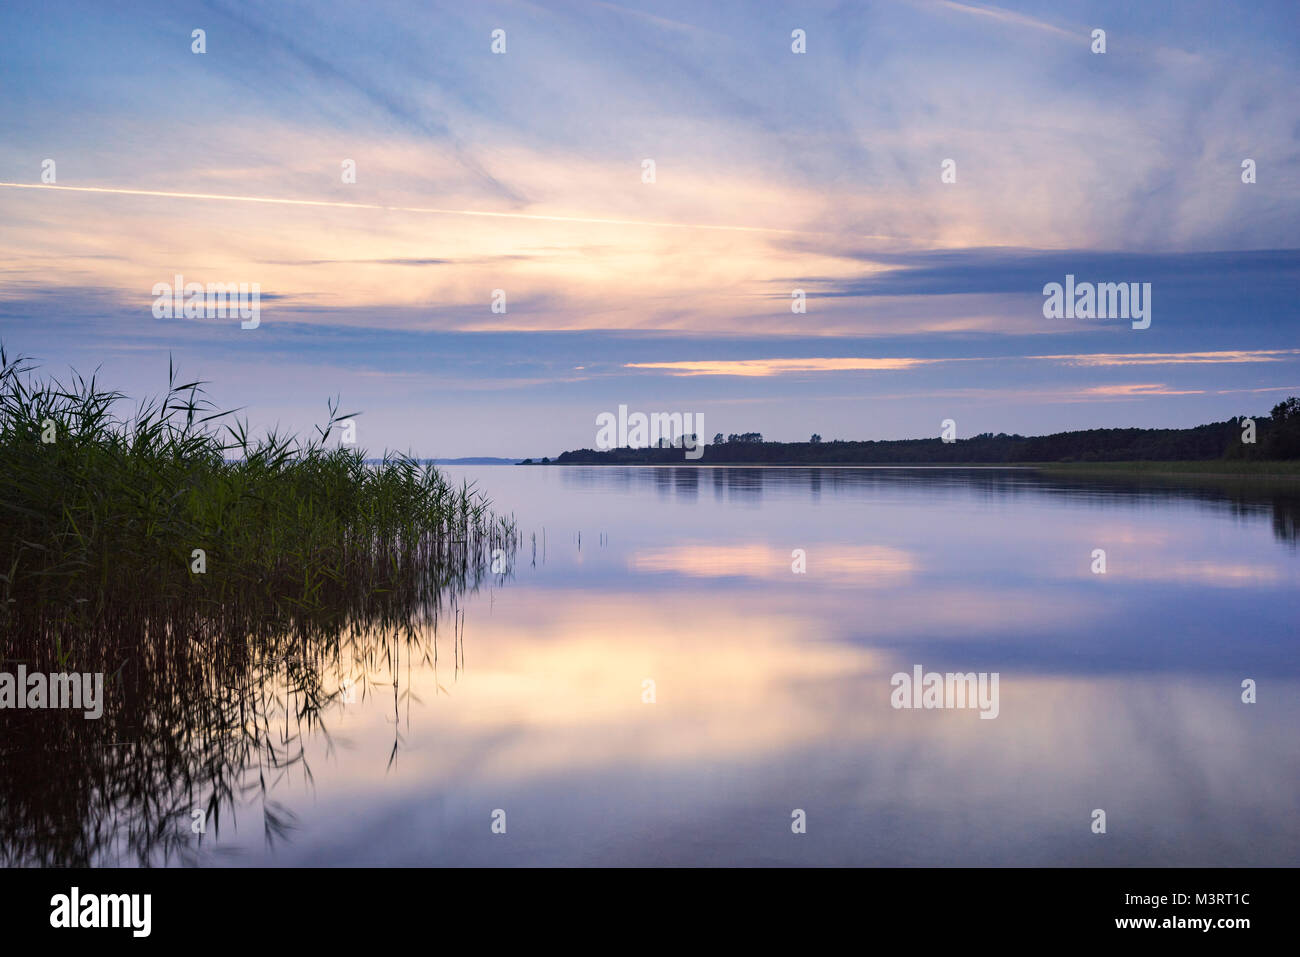 Lake Selent, Northern Germany, Schleswig-Holstein. Summer Sunset - Stock Image